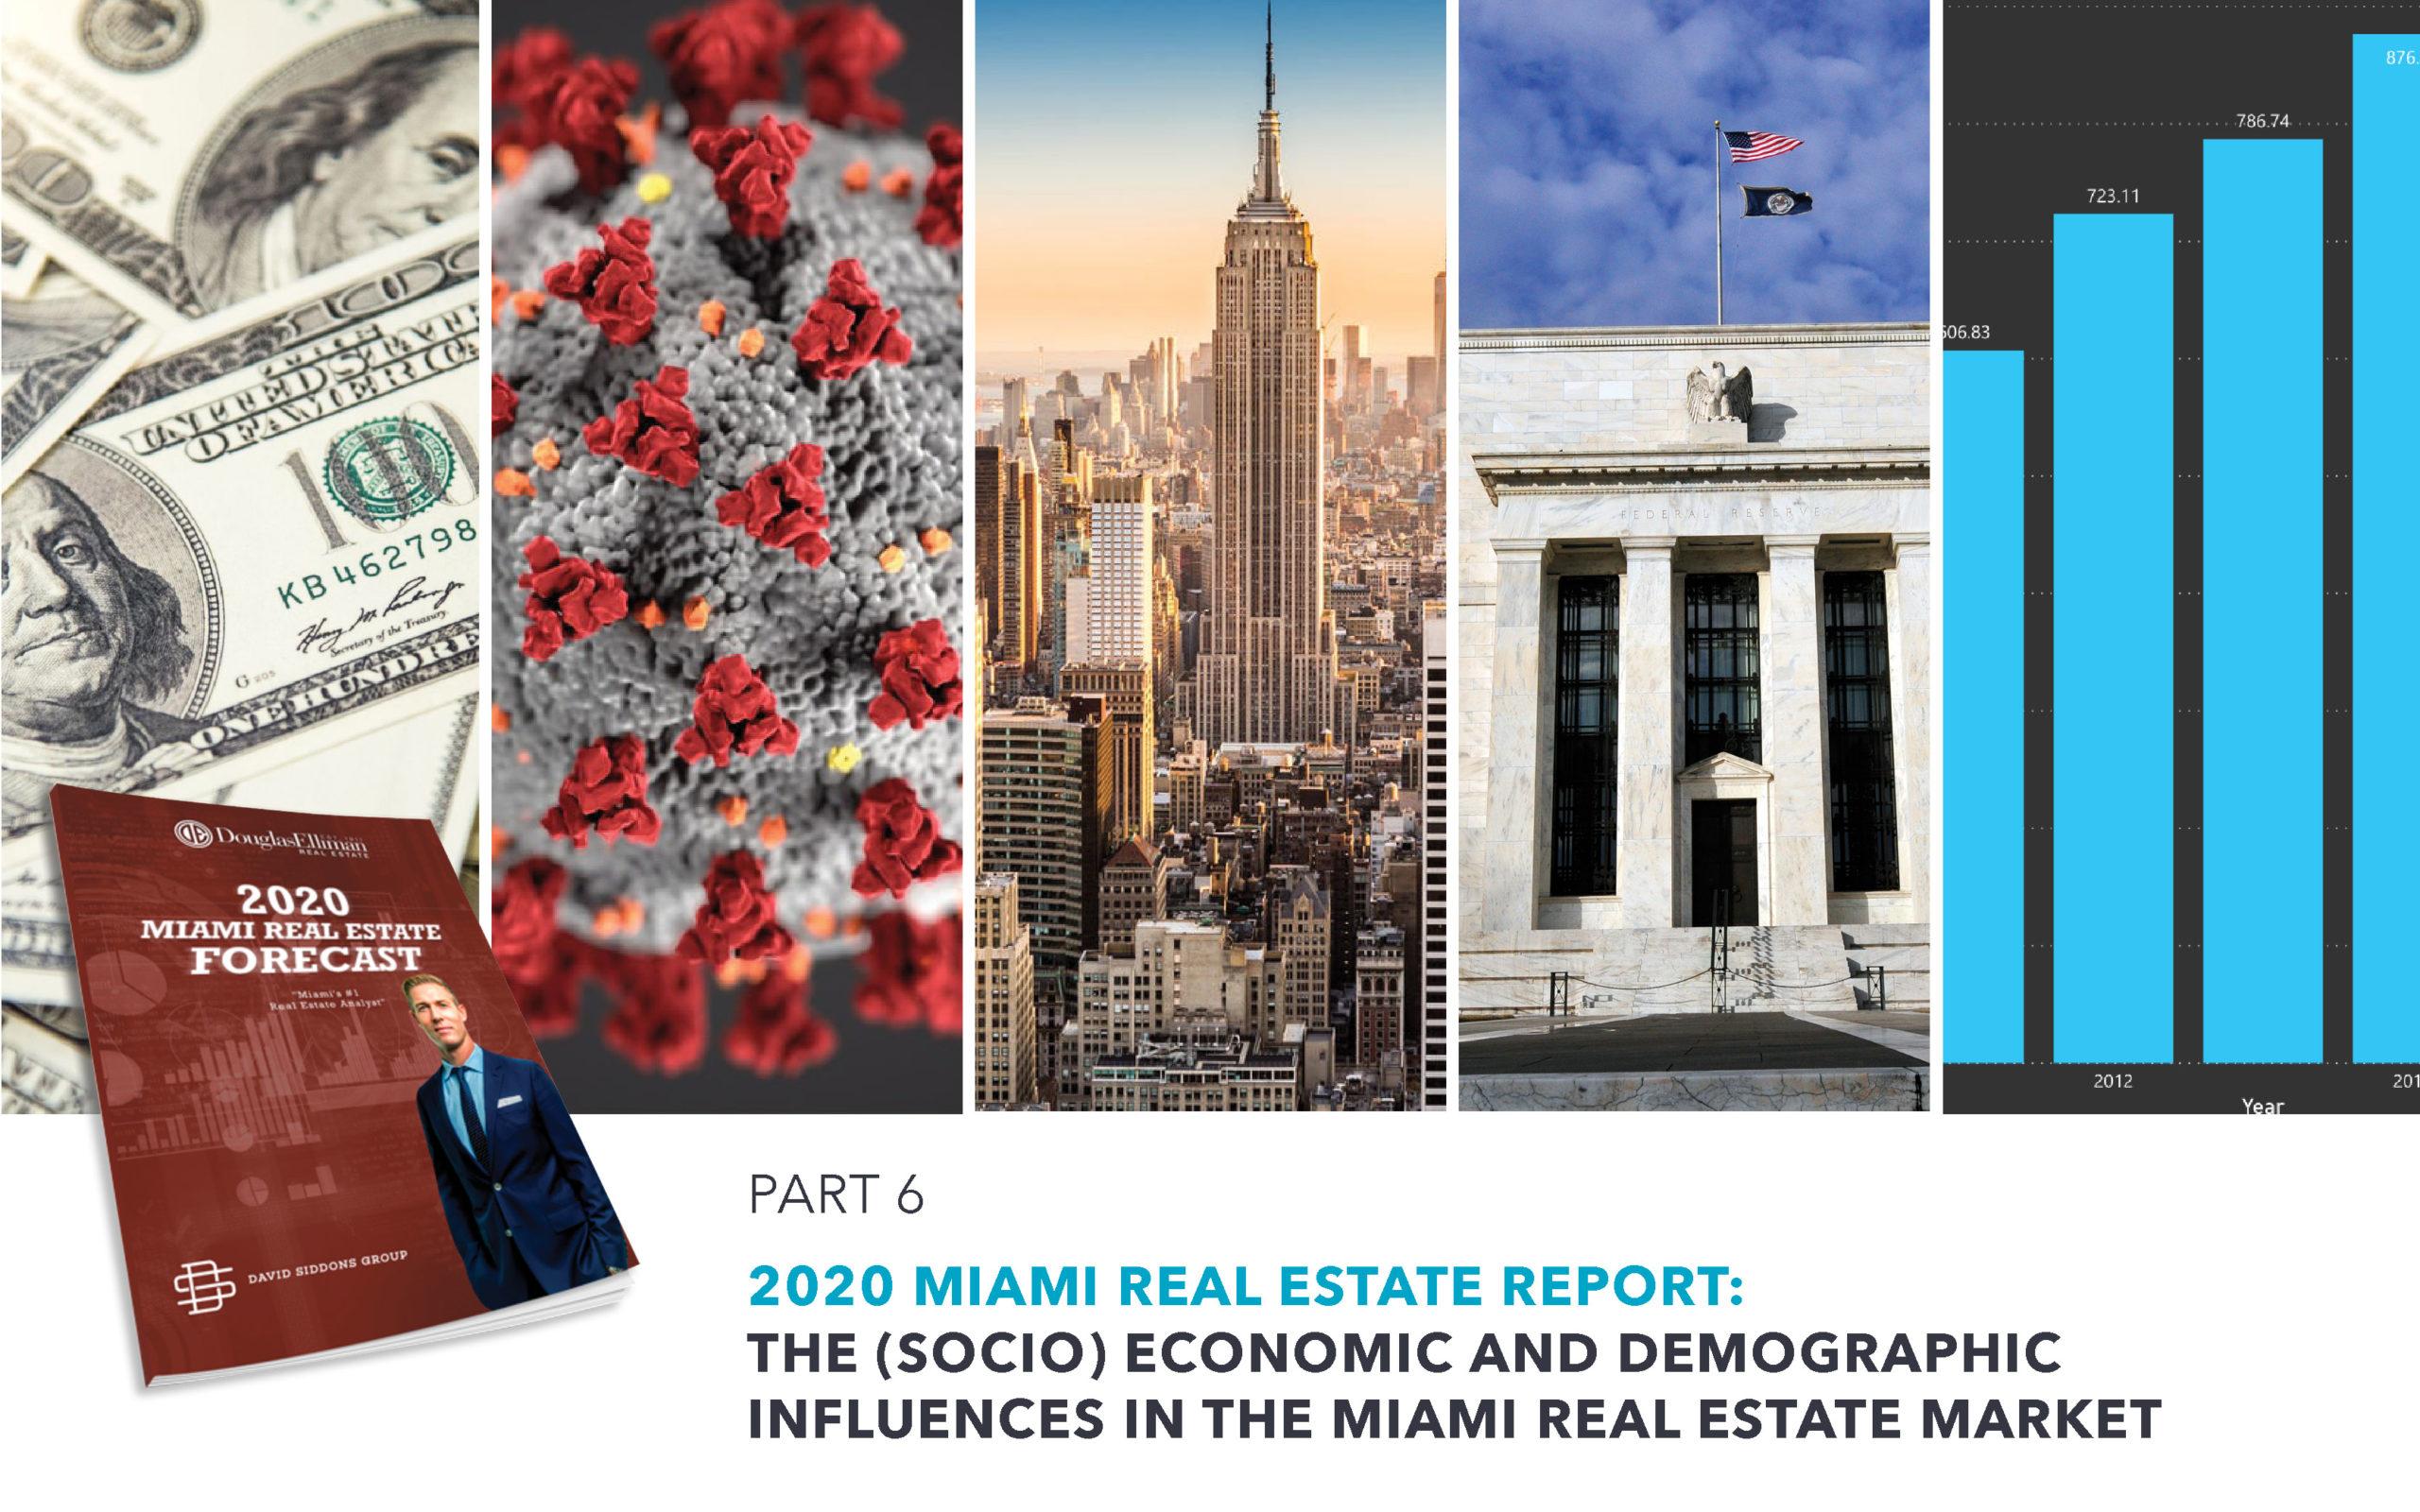 The 2020 Miami Real Estate Report: The (Socio) Economic and Demographic influences in the Market